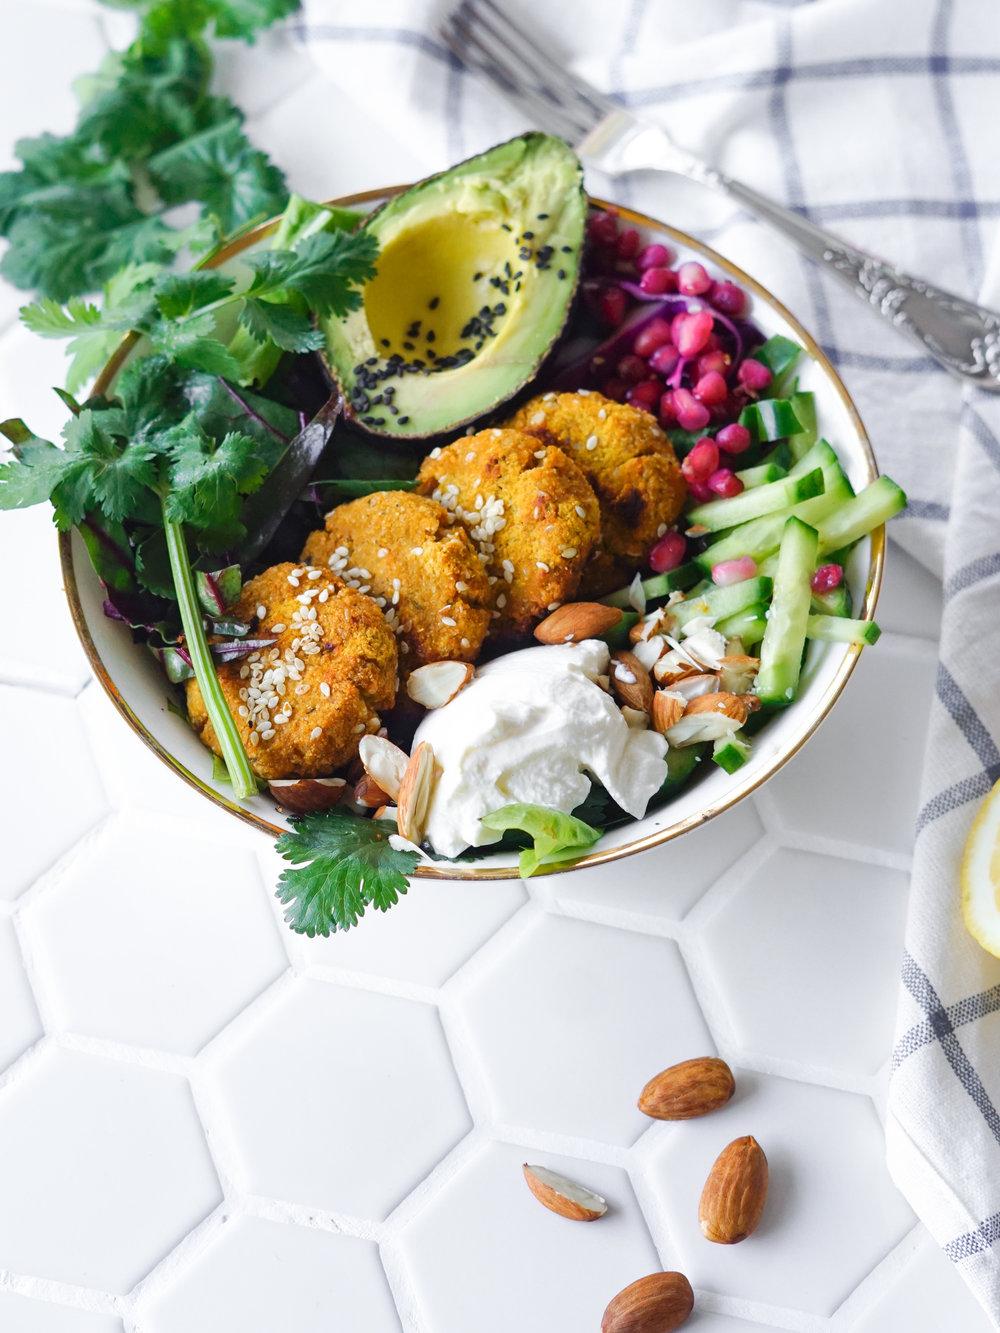 Falafel Health Food Project Food Photography